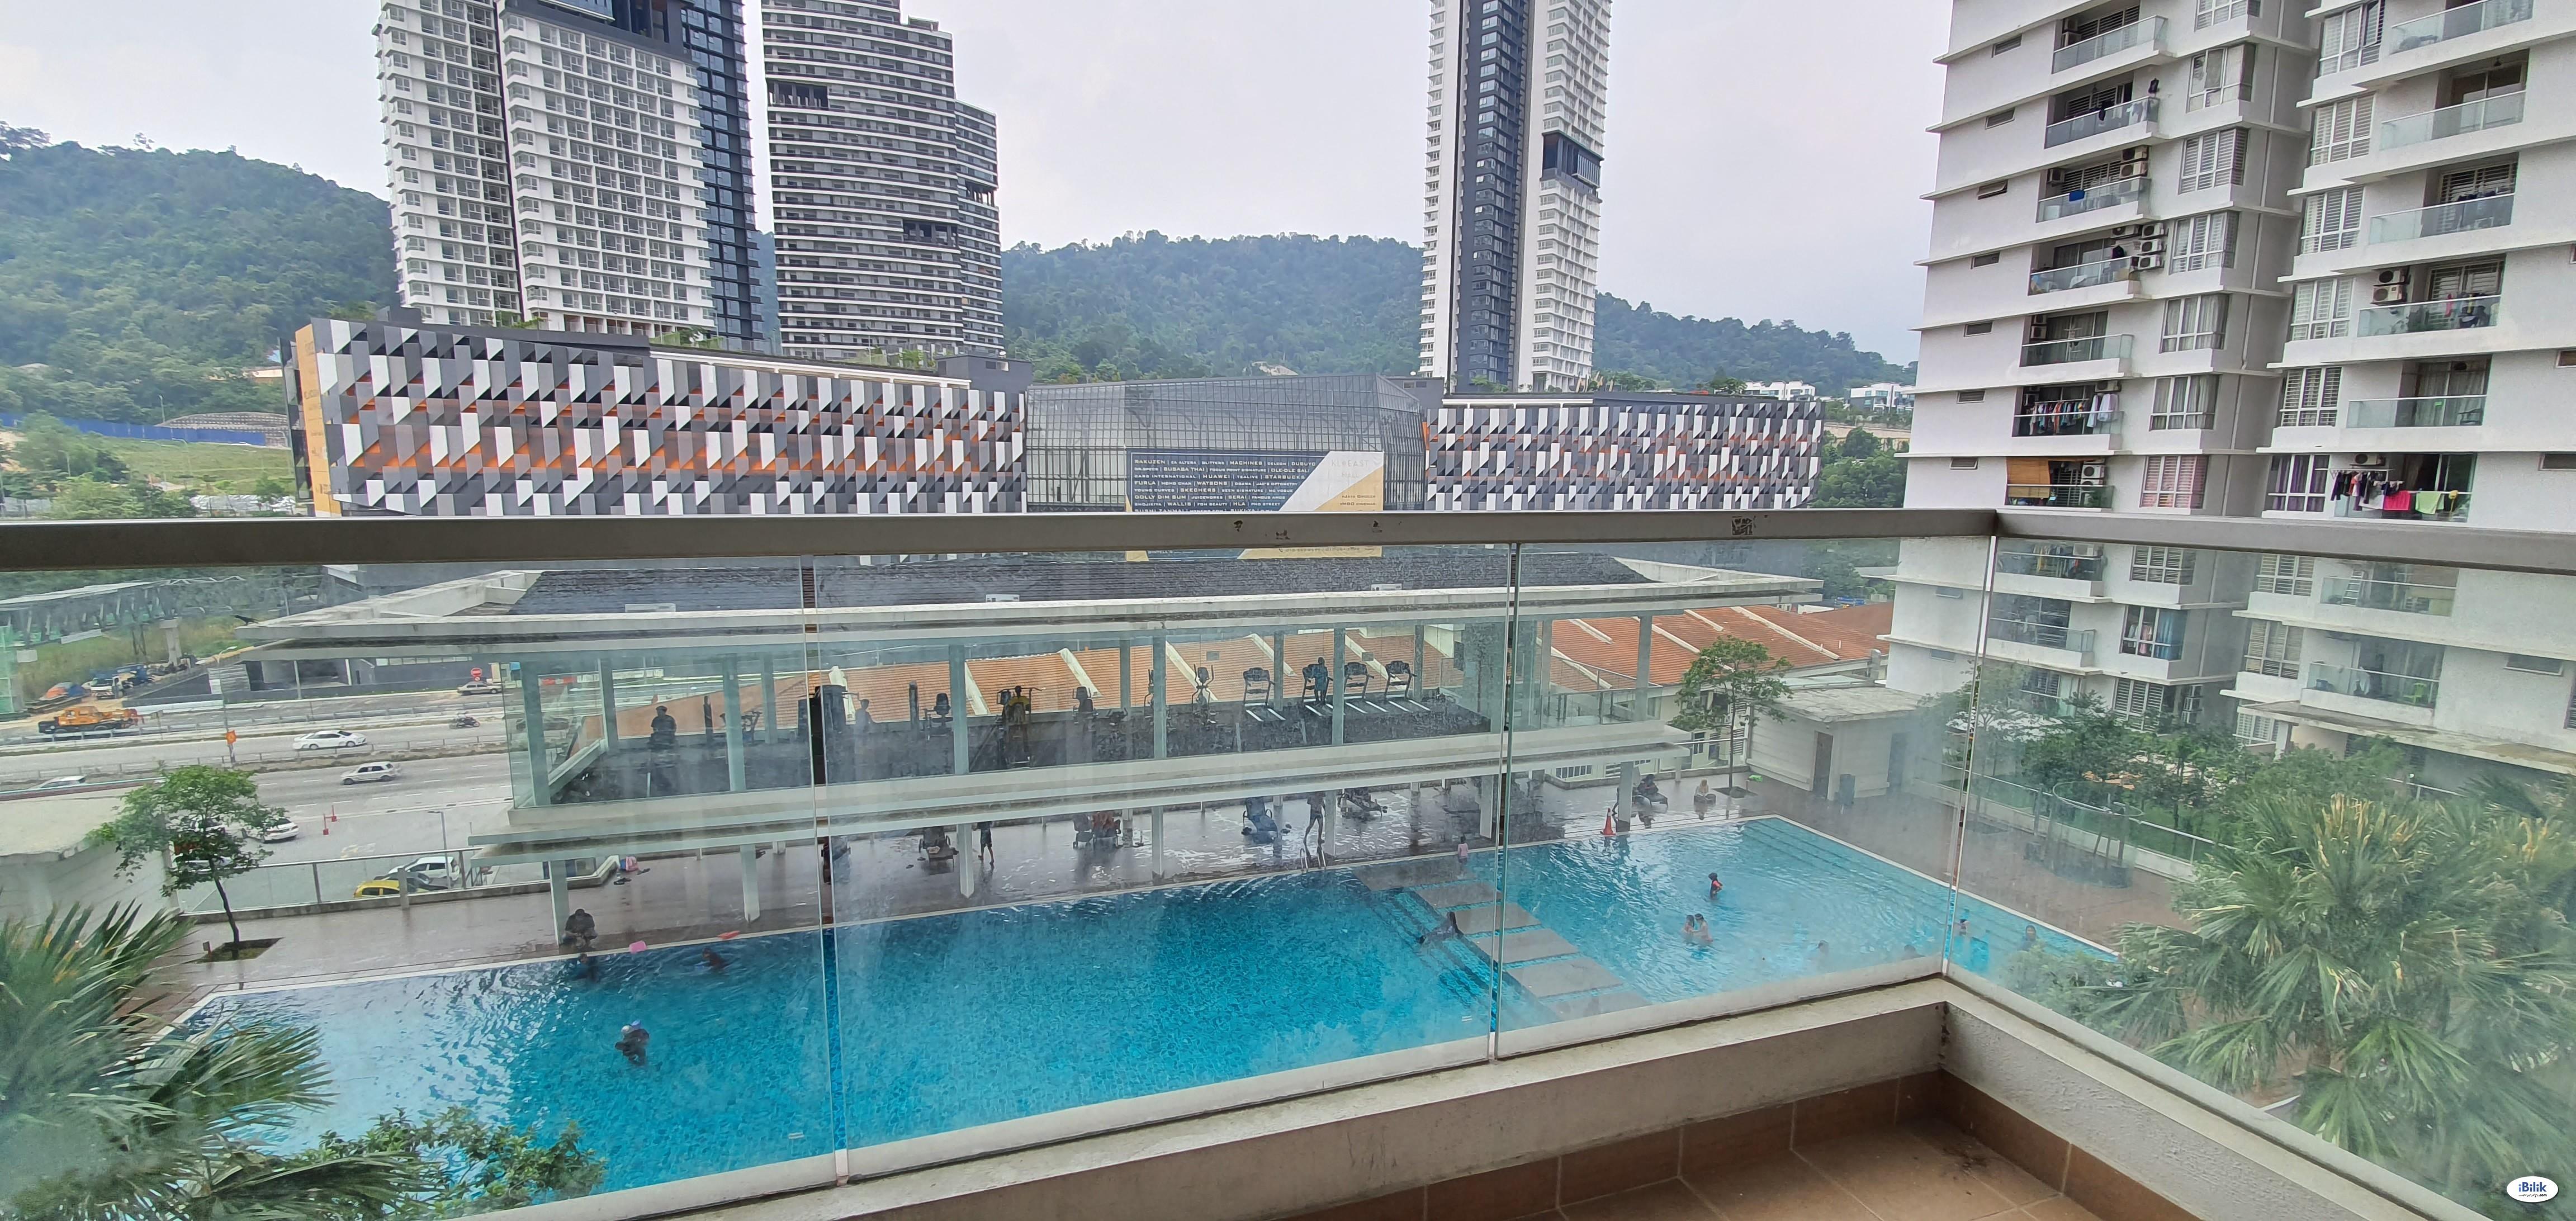 PV2 Condo (Furnished Room) @ KL East, LRT Taman Melati